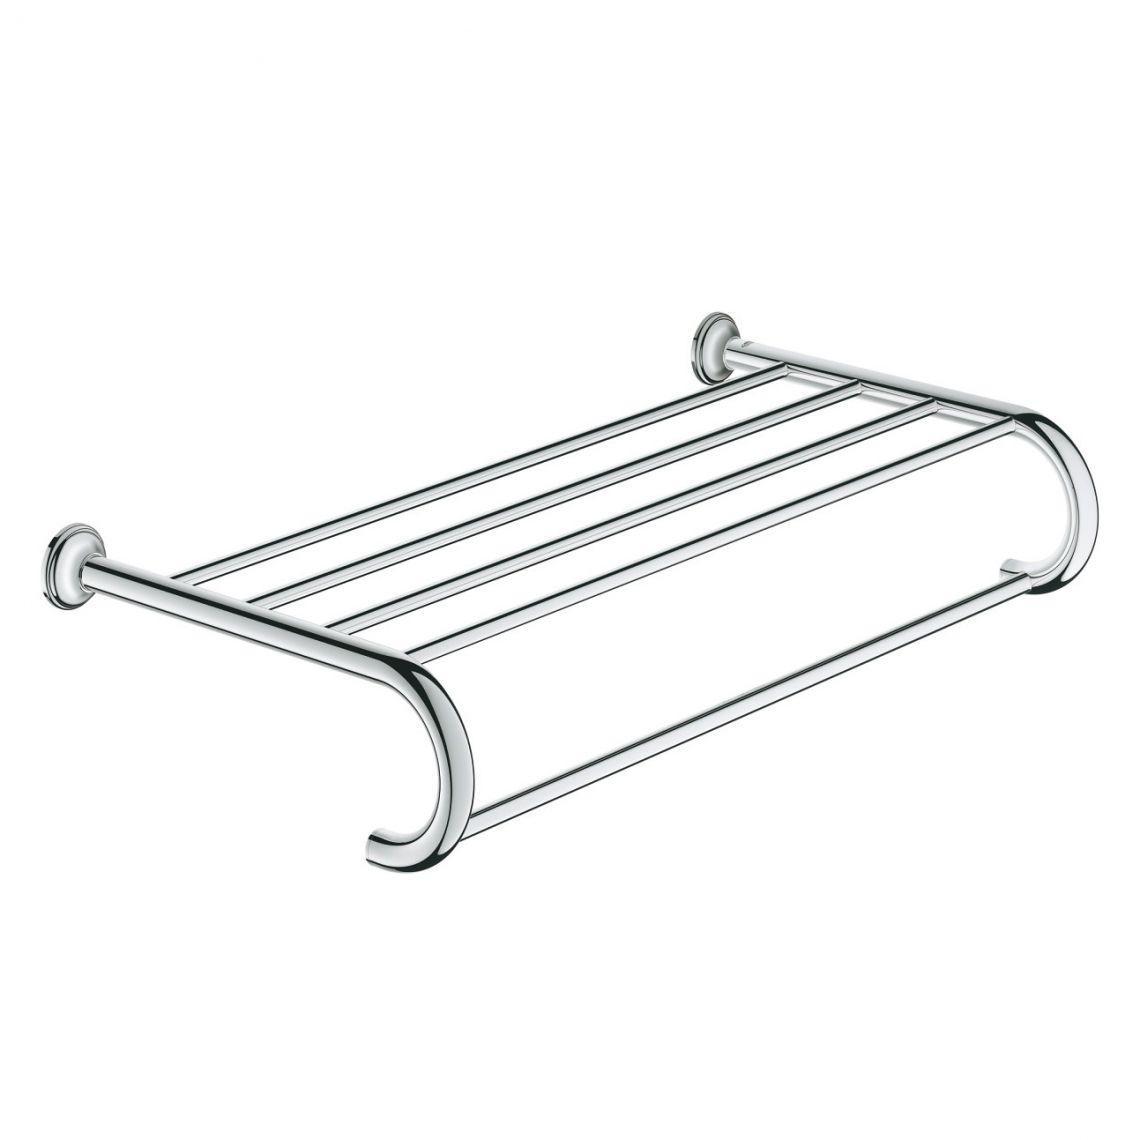 Полочка для полотенец Grohe Essentials Authentic 58,6 (40660001)